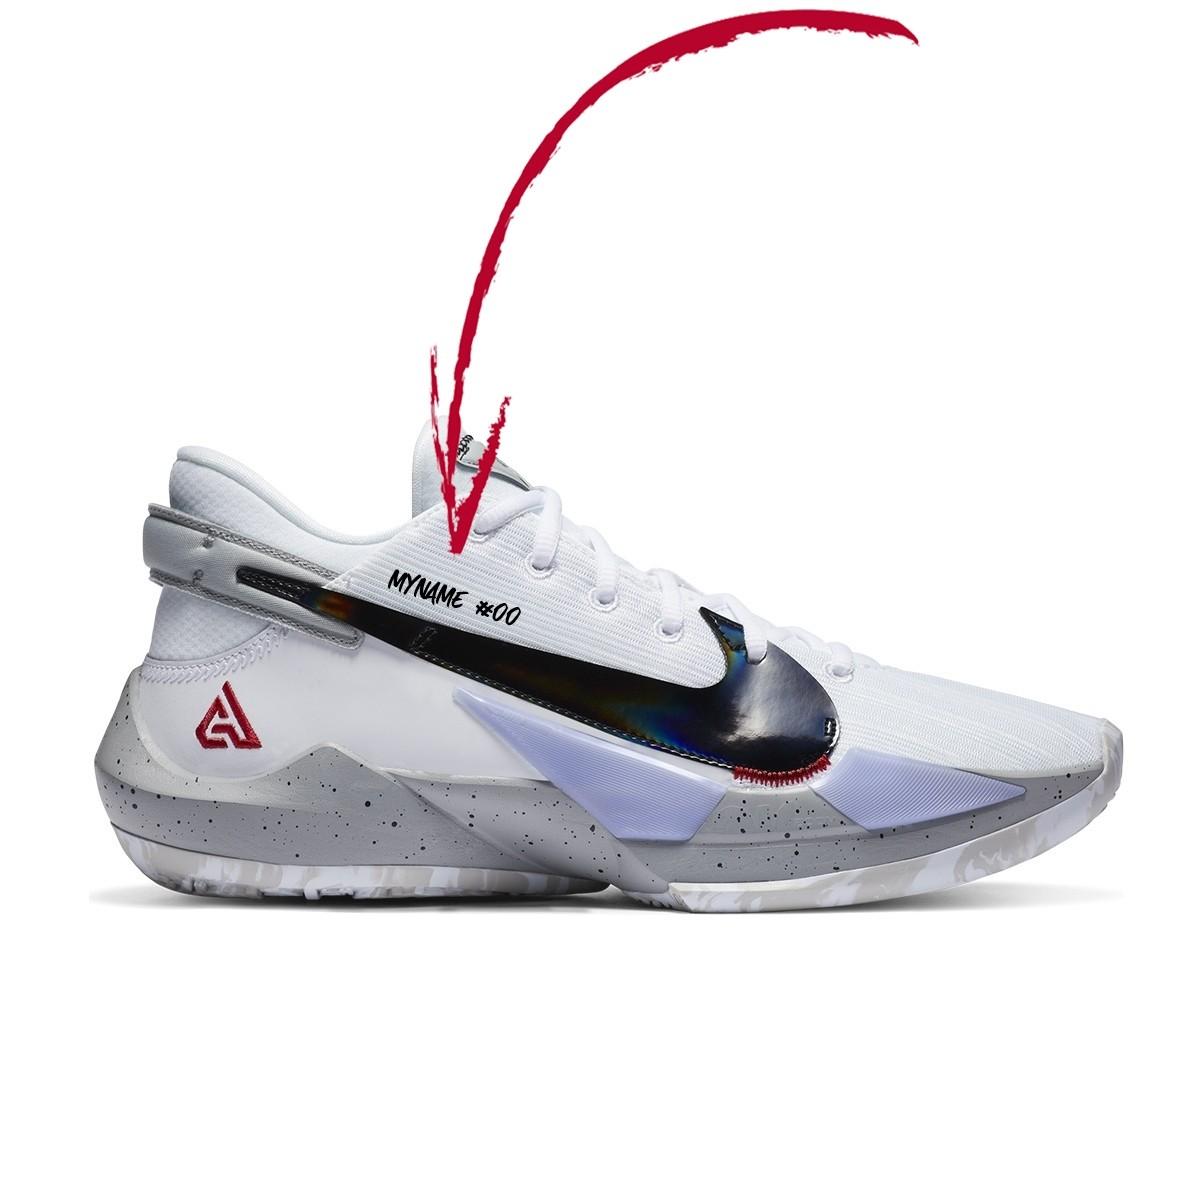 Nike Zoom Freak 2 'White Cement'-CK5424-100